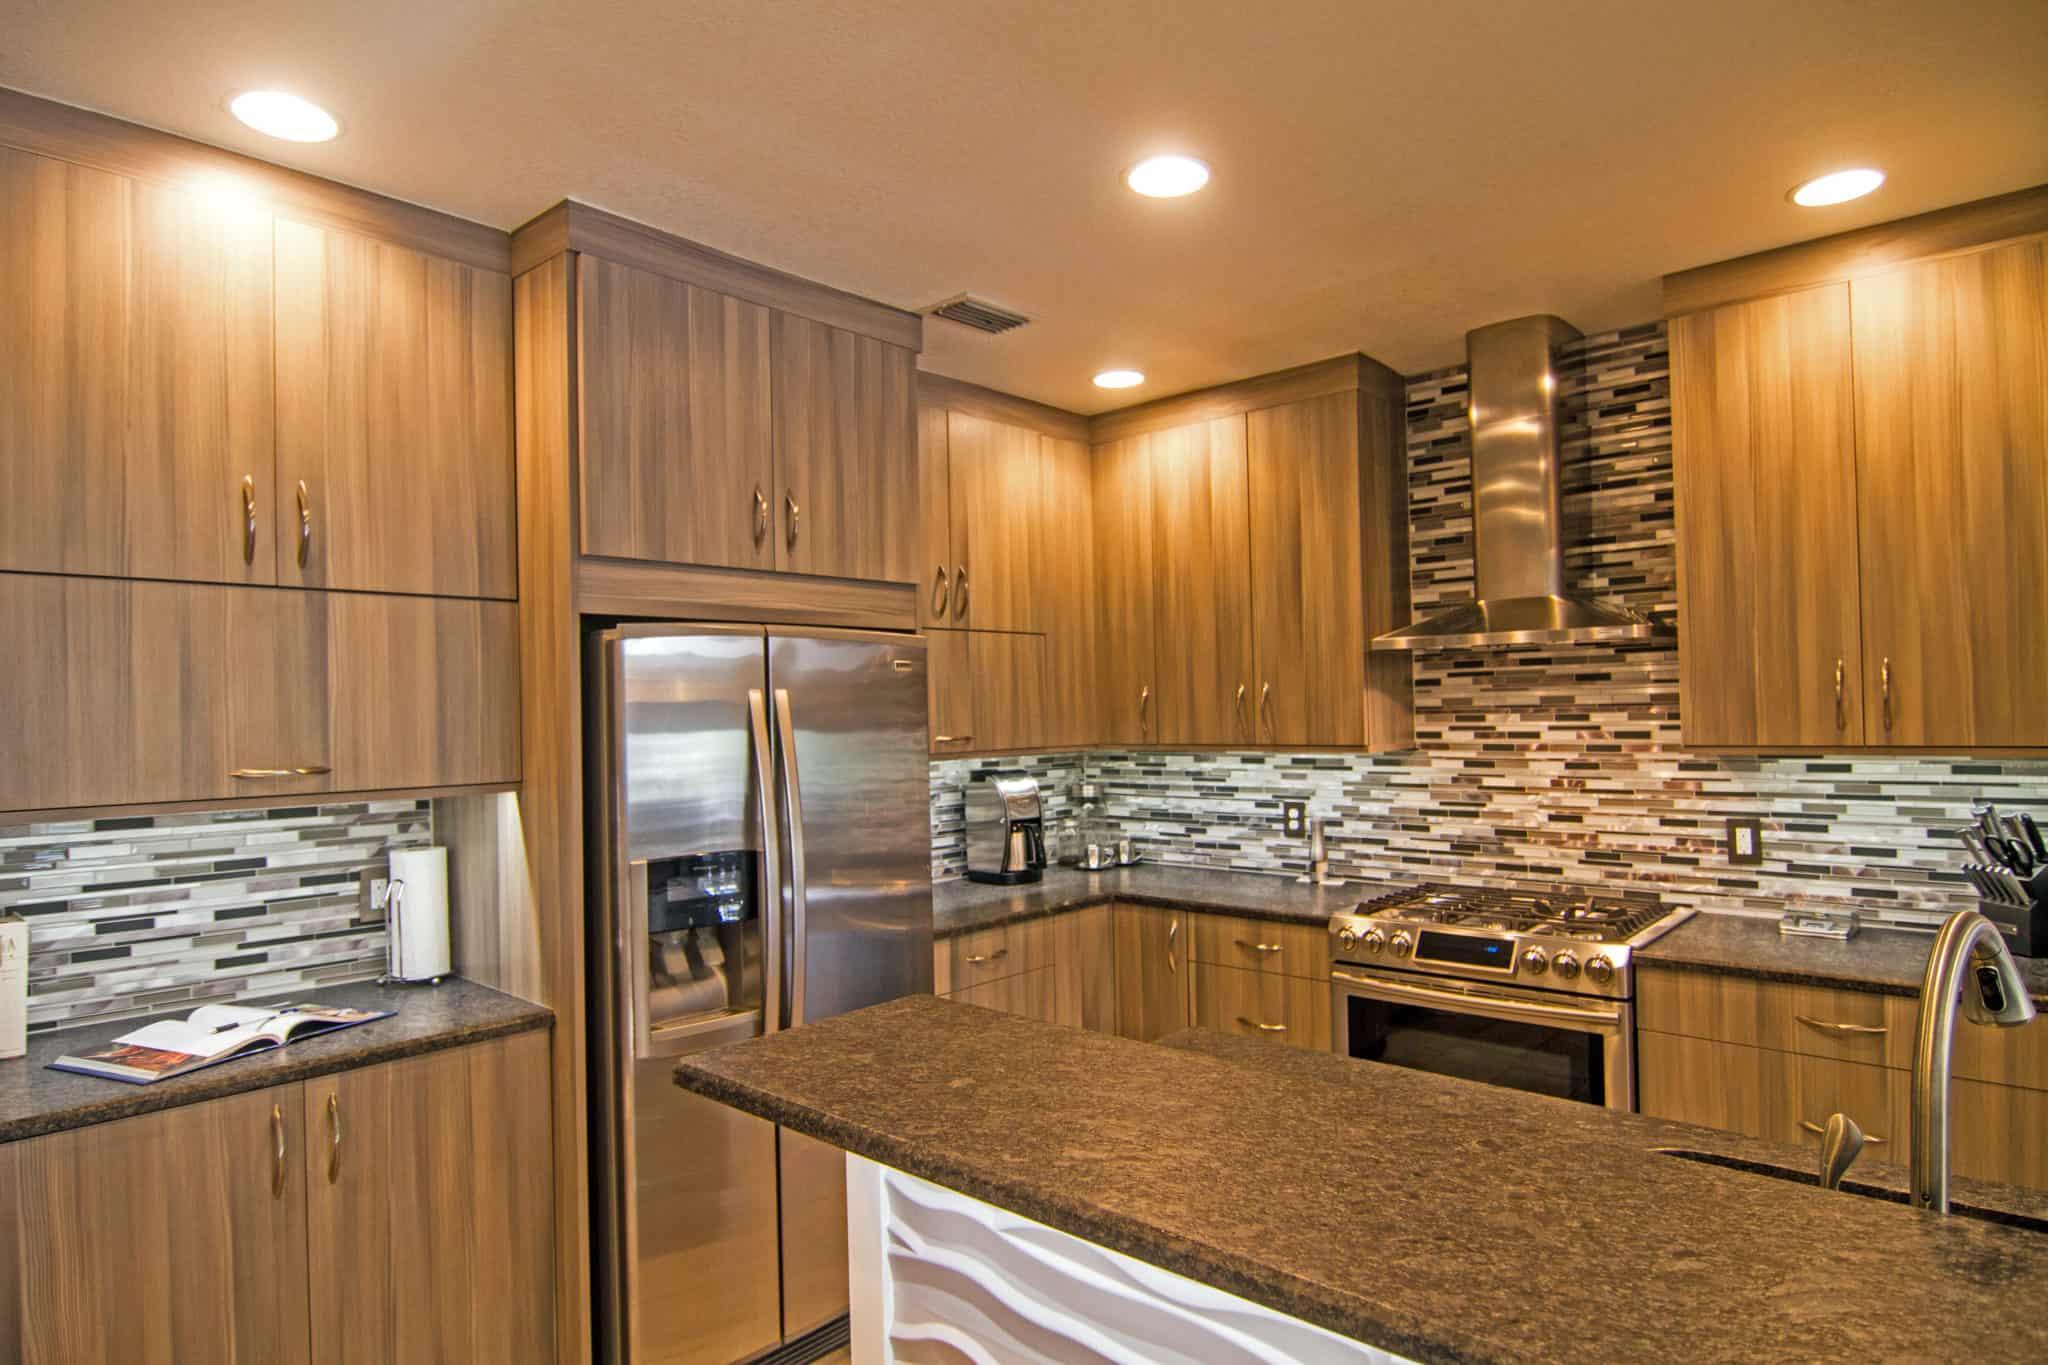 wood grain cabinets